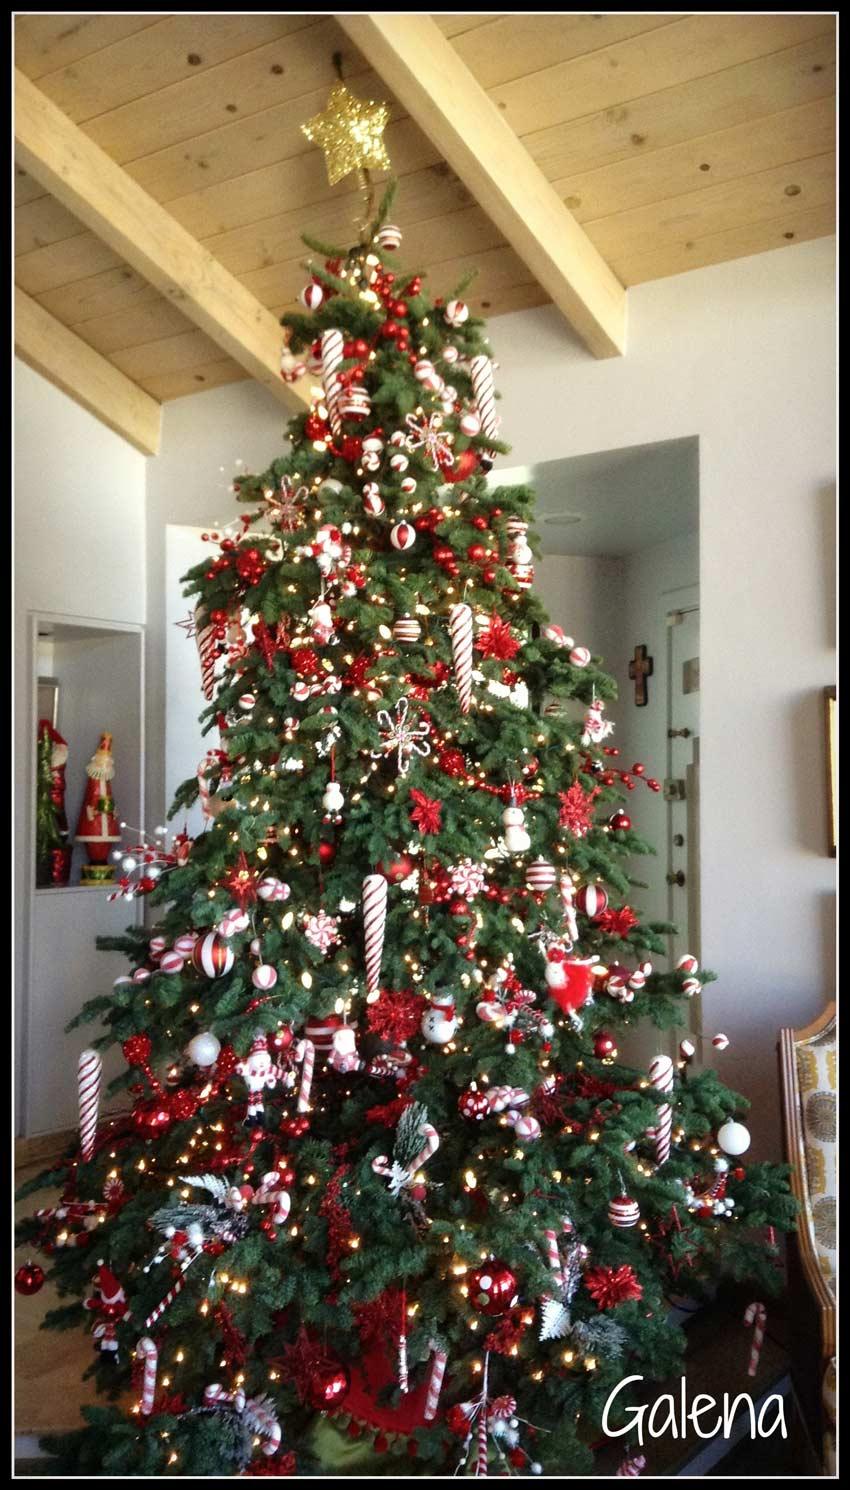 Navidad-Christmas-Arbol-Navideño-mi-árbol-de-navidad